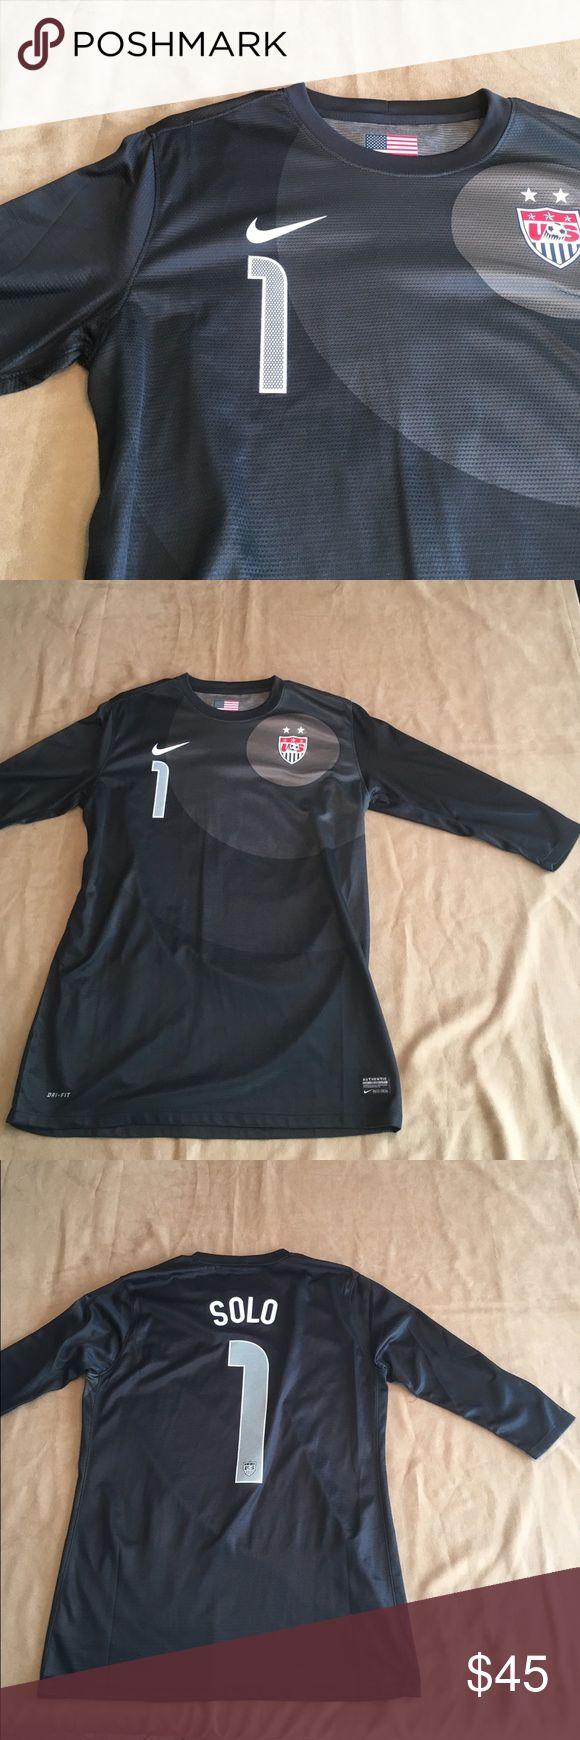 Nike dryfit Hope Solo soccer jersey Nike dryfit Hope Solo soccer jersey. New without tags. Nonsmoking home. Nike Tops